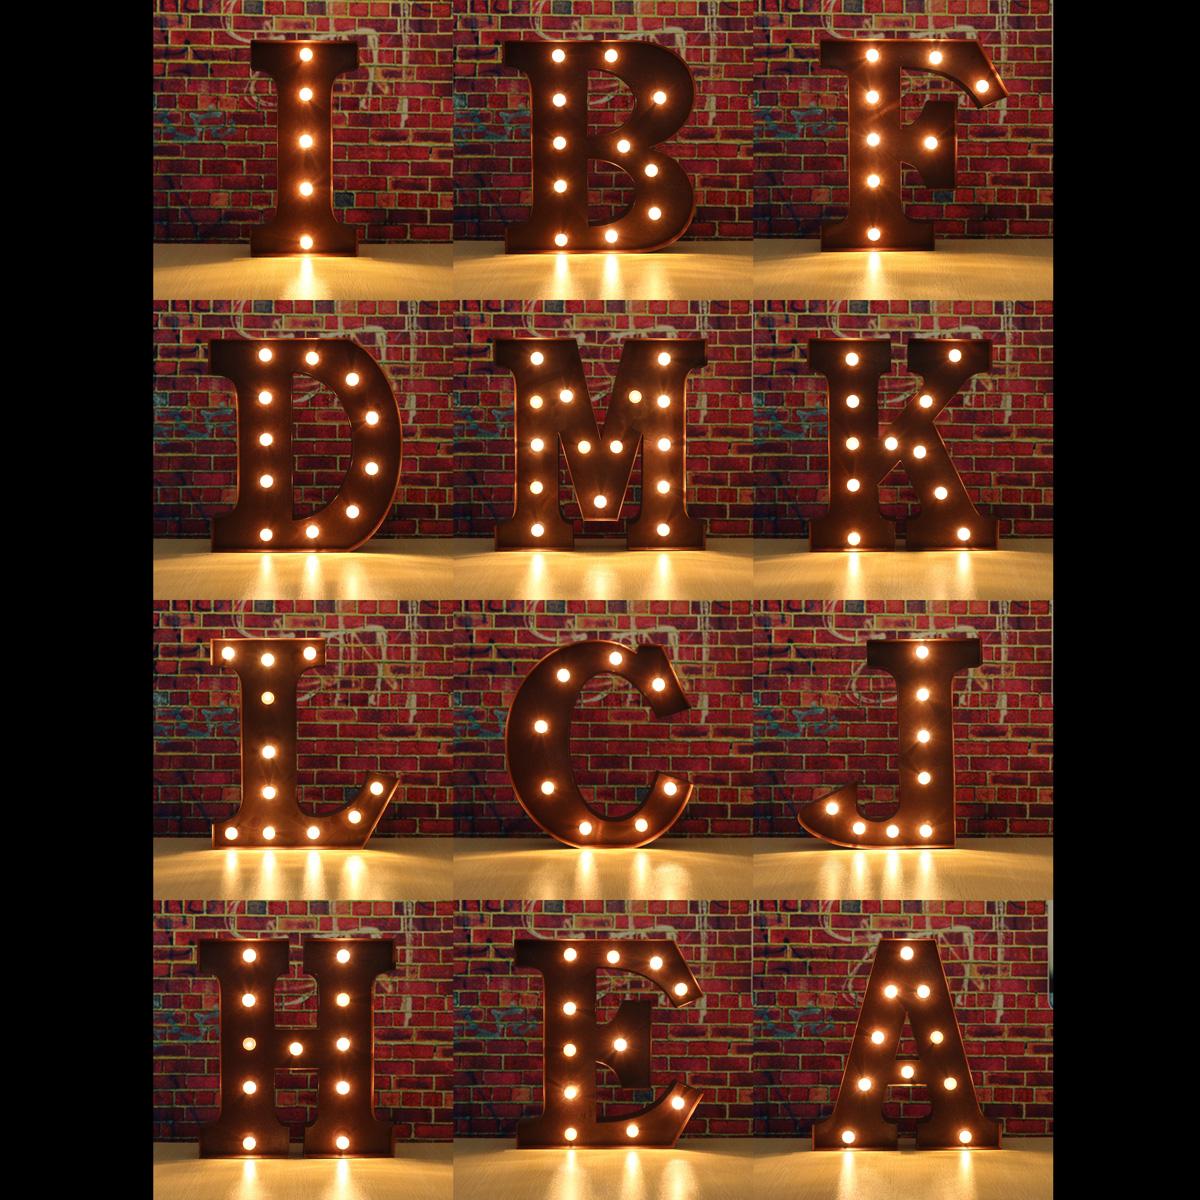 LUZ-LED-Letra-Alfabeto-Carnaval-Vintage-Circo-Luz-Metal-Carpa-A-X-Letras-Luces